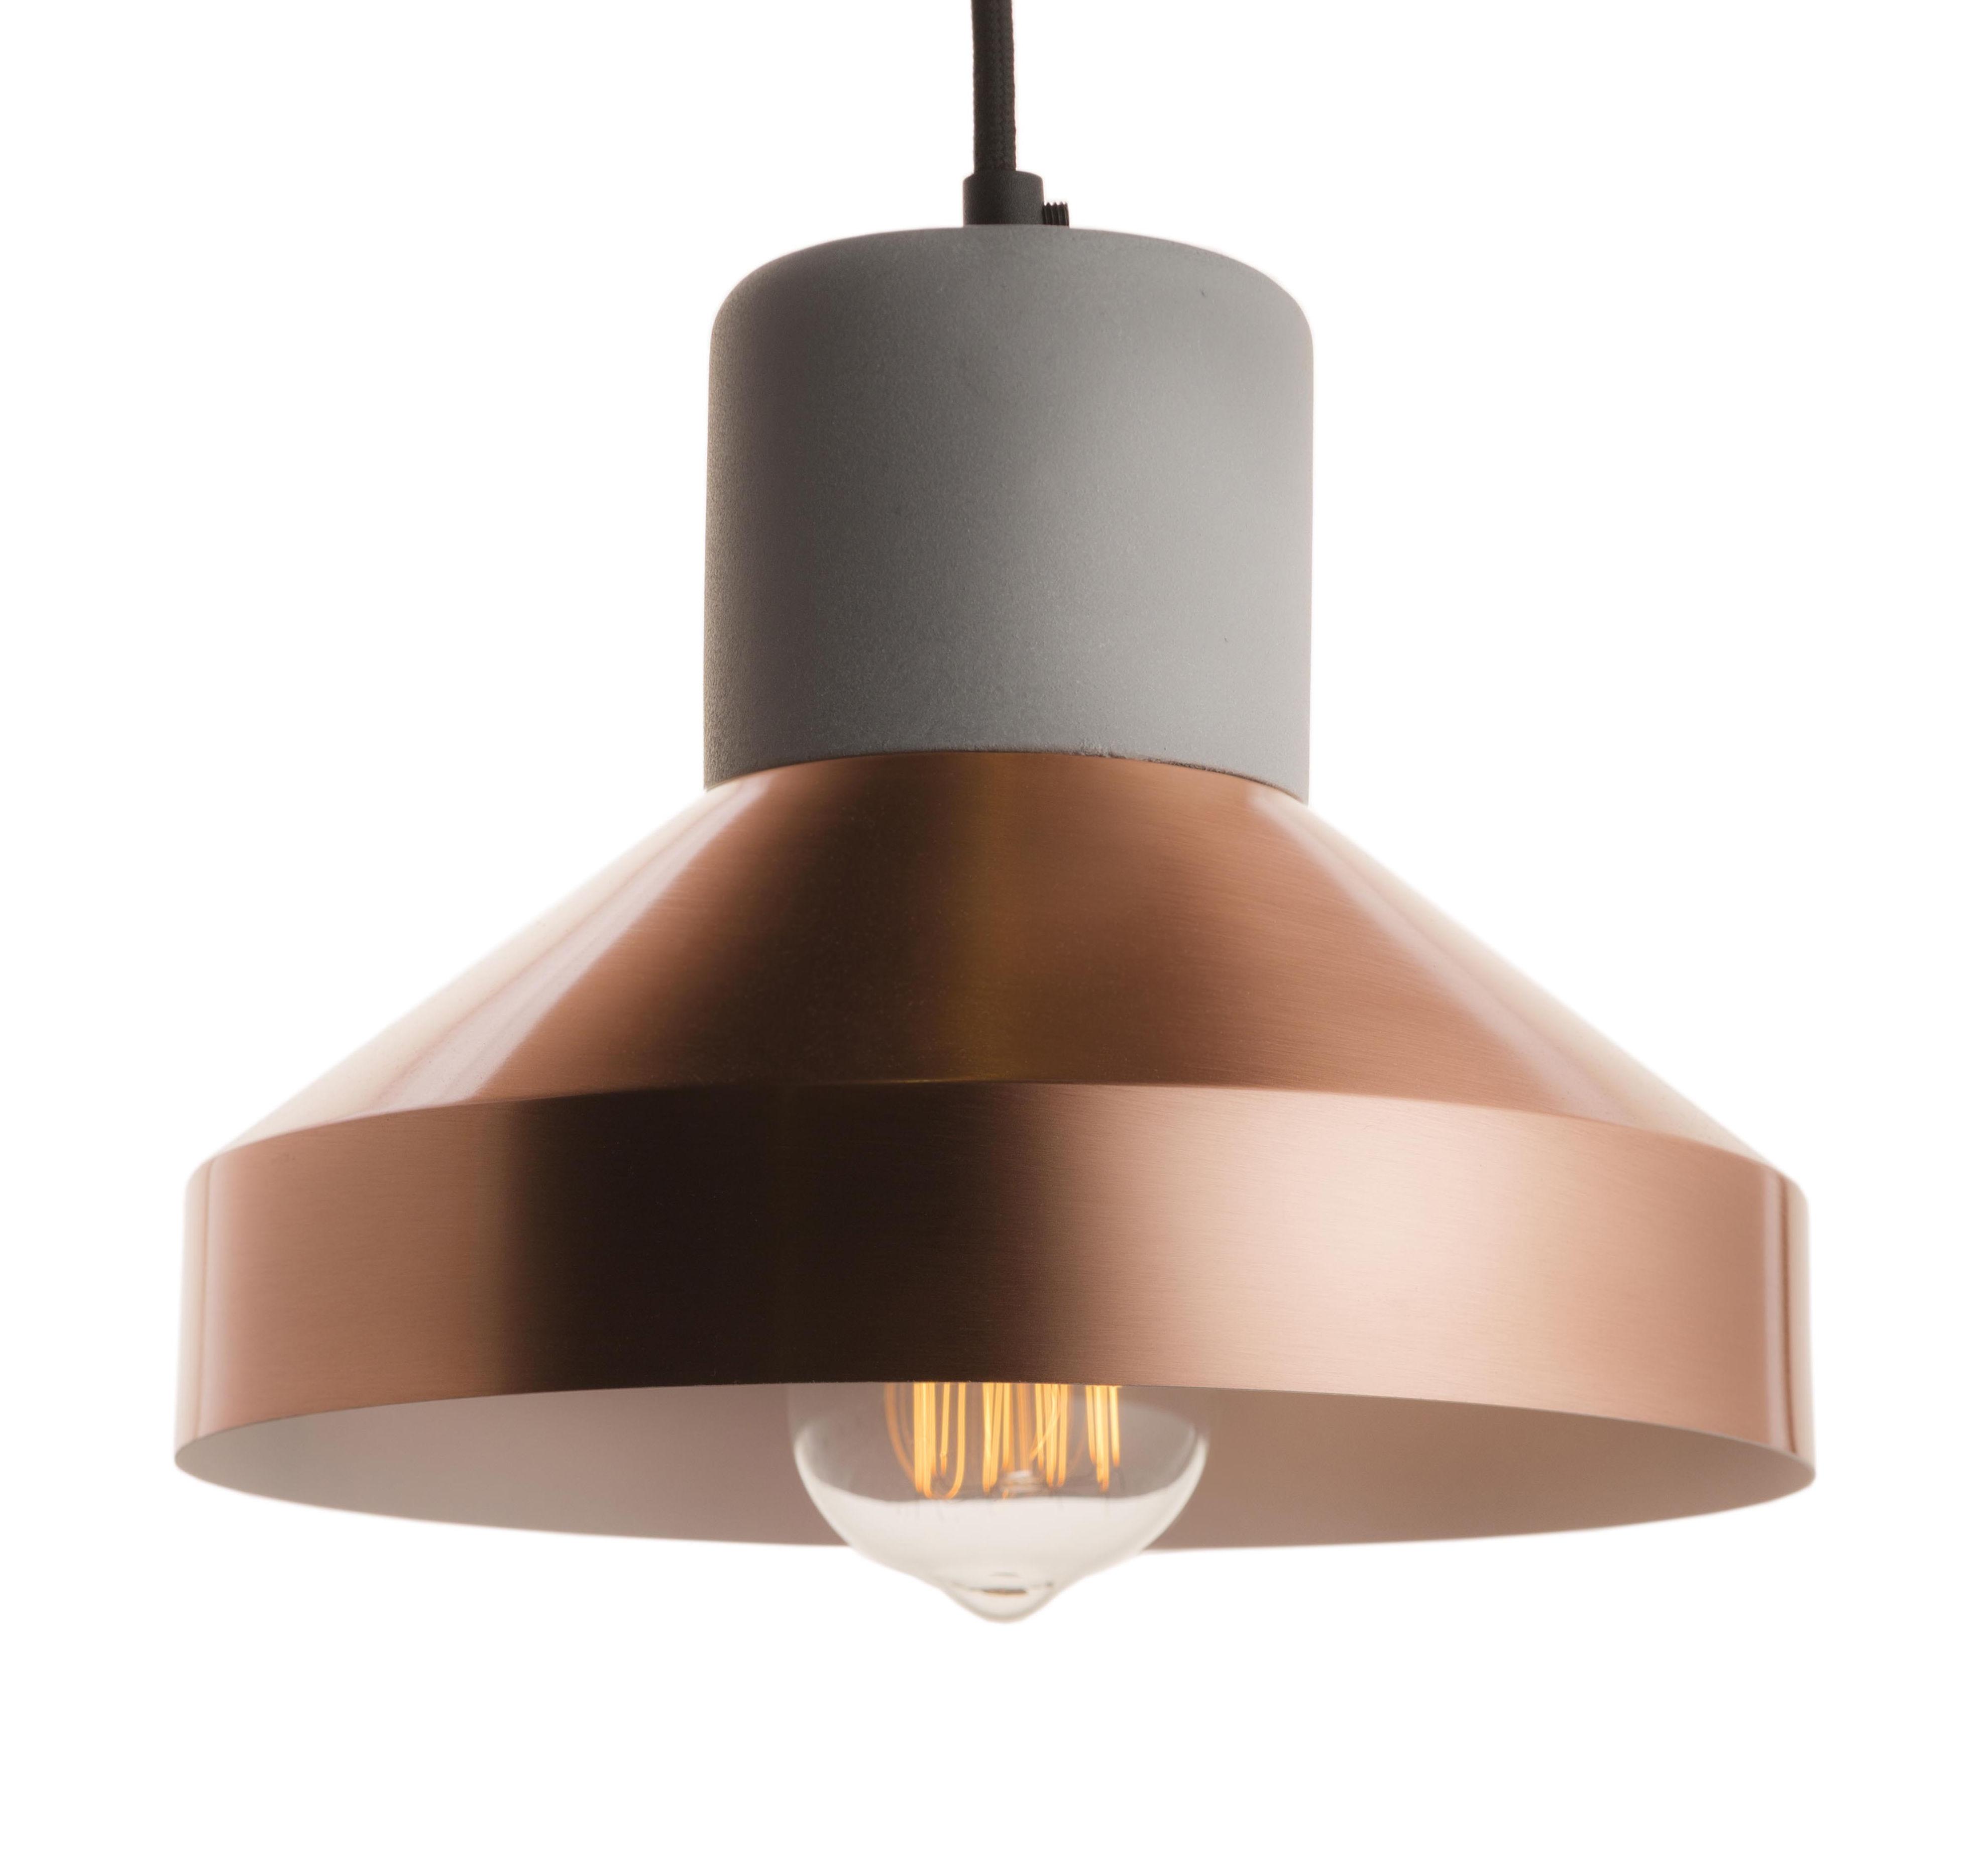 Lighting - Pendant Lighting - Steel Wood L Pendant - Concrete & Matt metal - Ø 24 cm by Spécimen Editions - Concrete / Diffuser matt copper - Concrete, Metal with matt copper finish